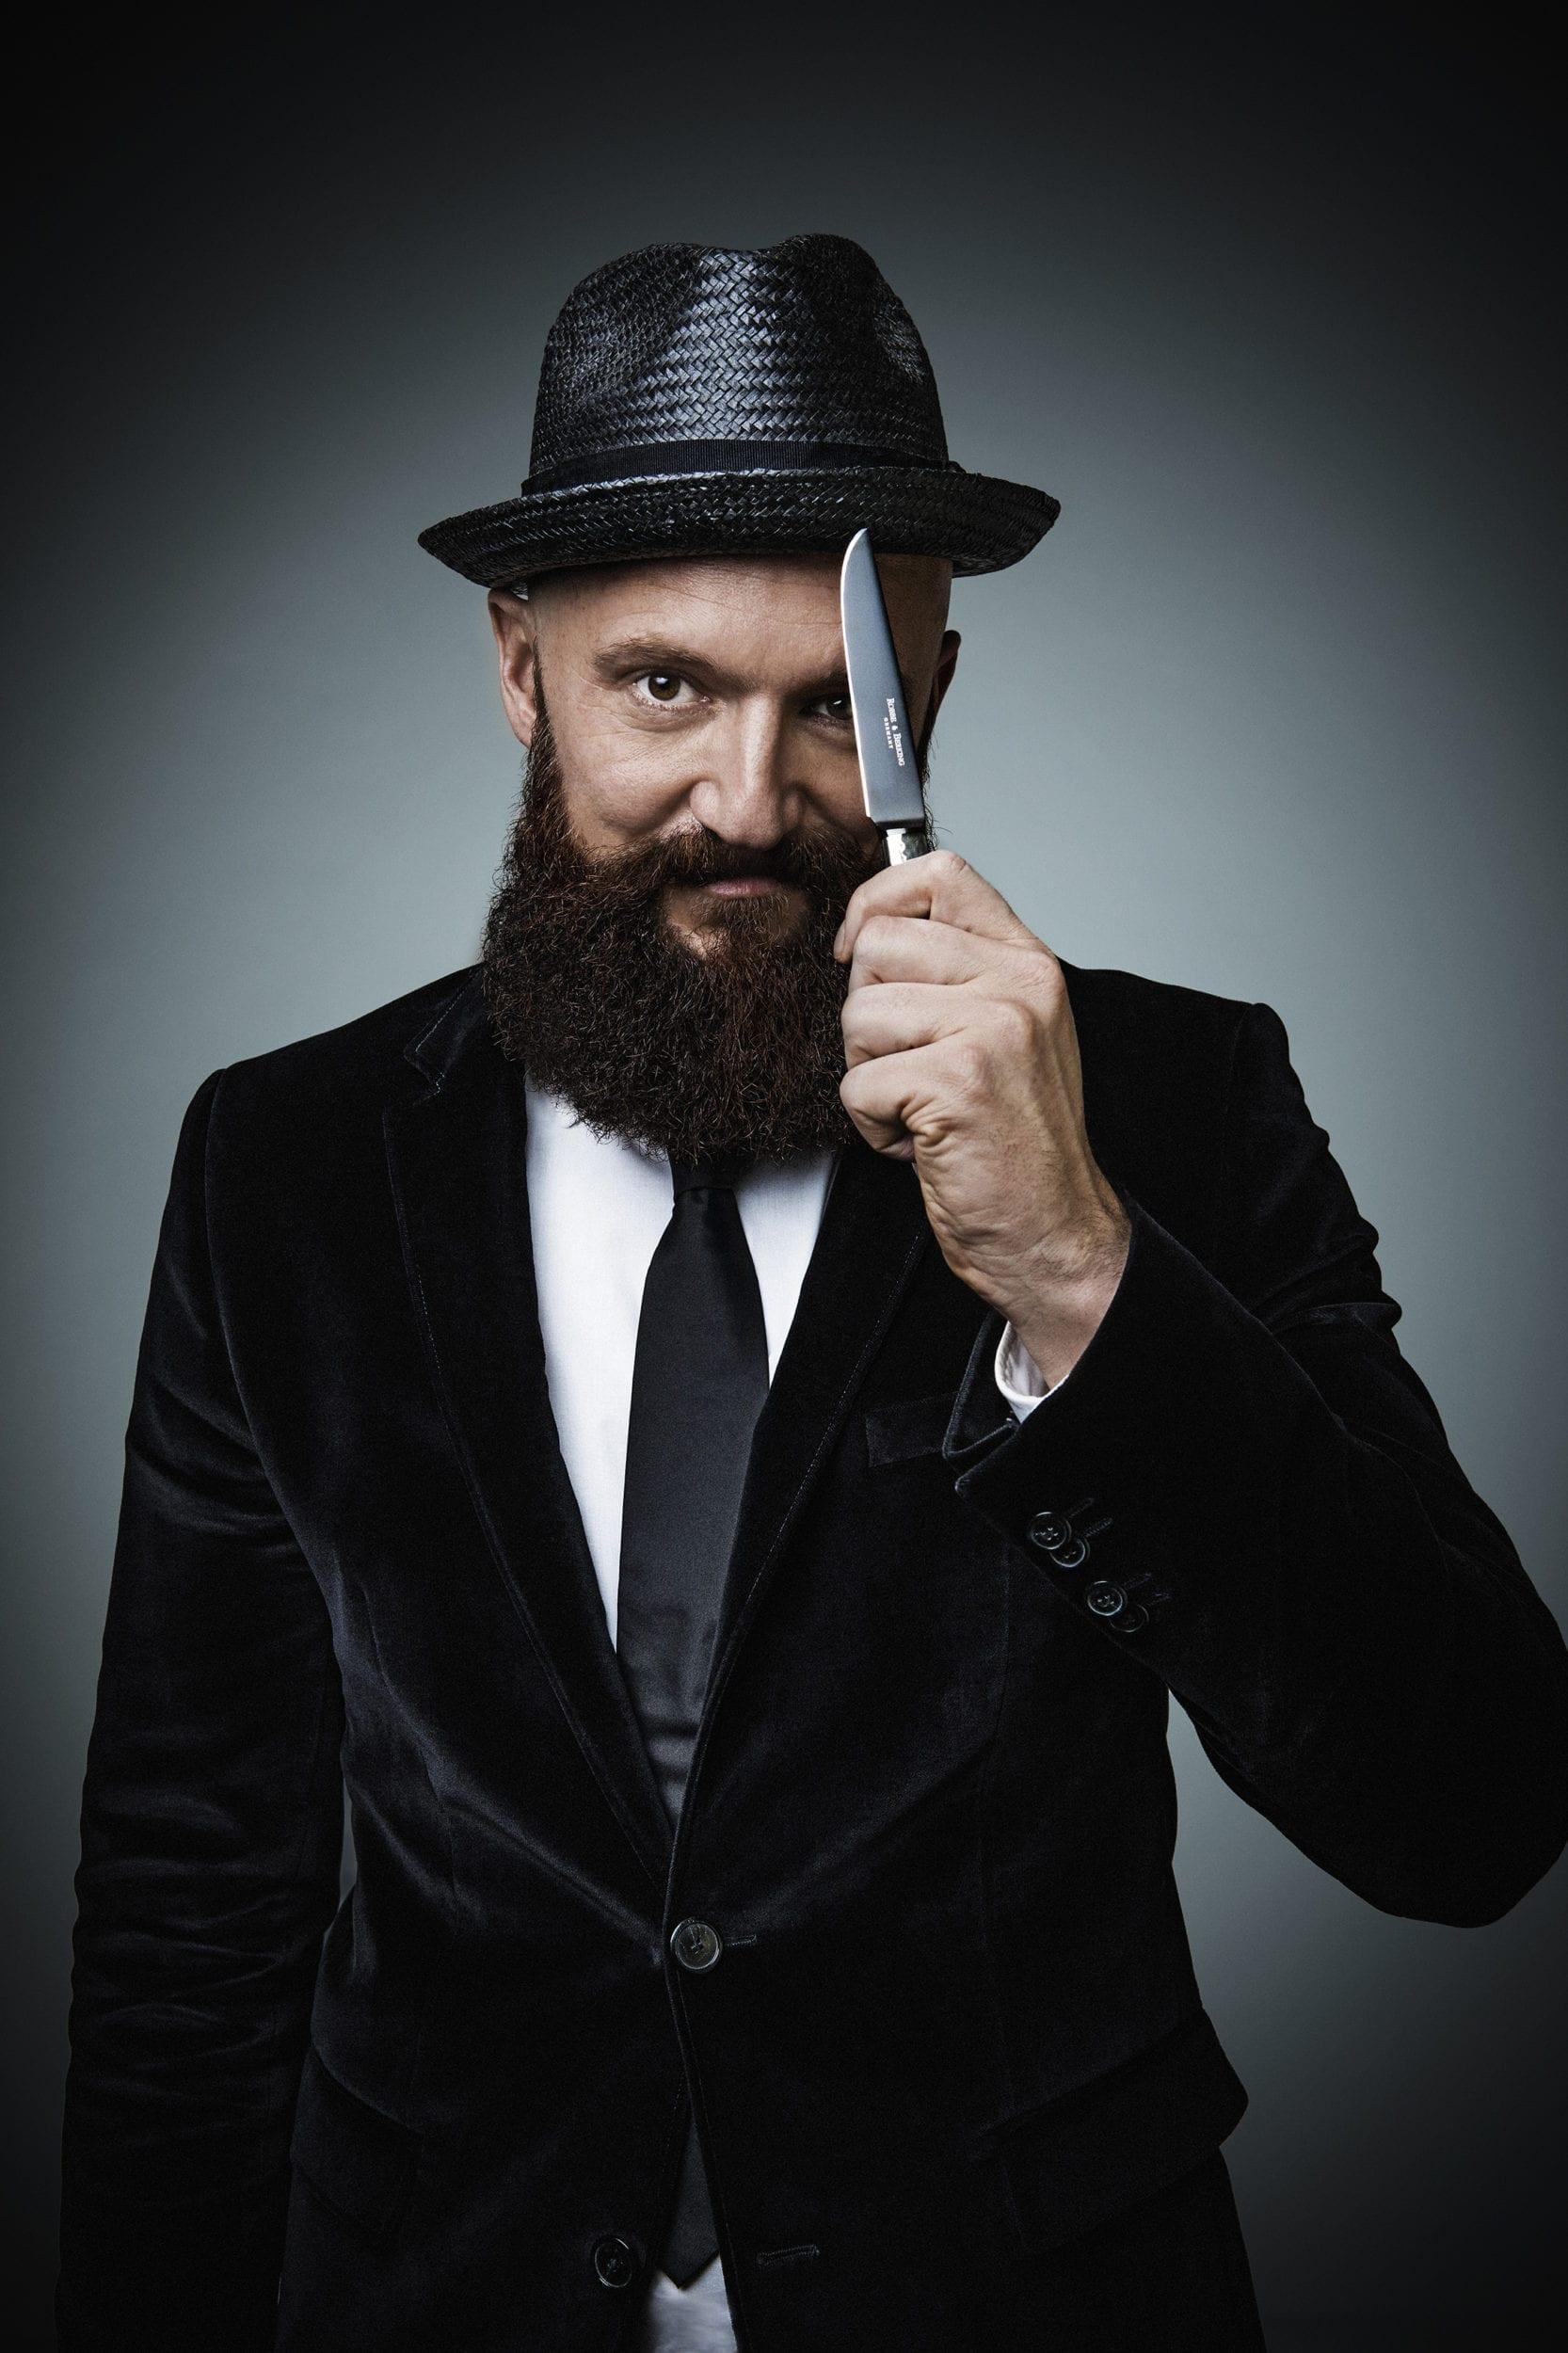 Mann mit Hut   Man with hat STYLISH BARBECUE